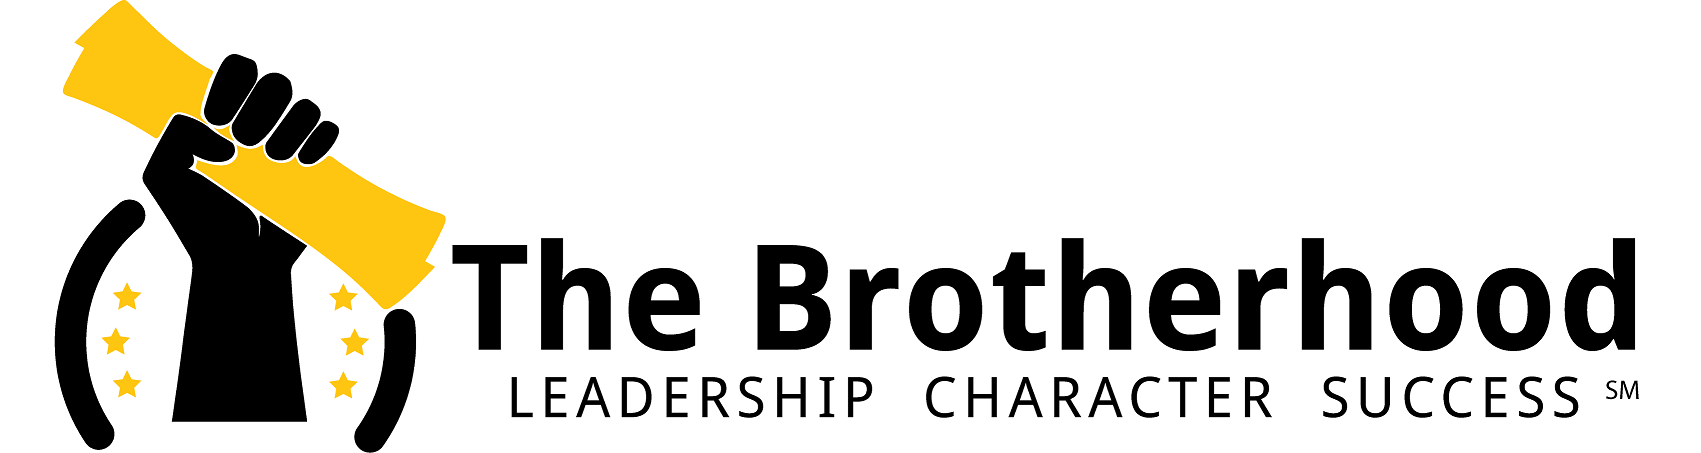 The Brotherhood Logo